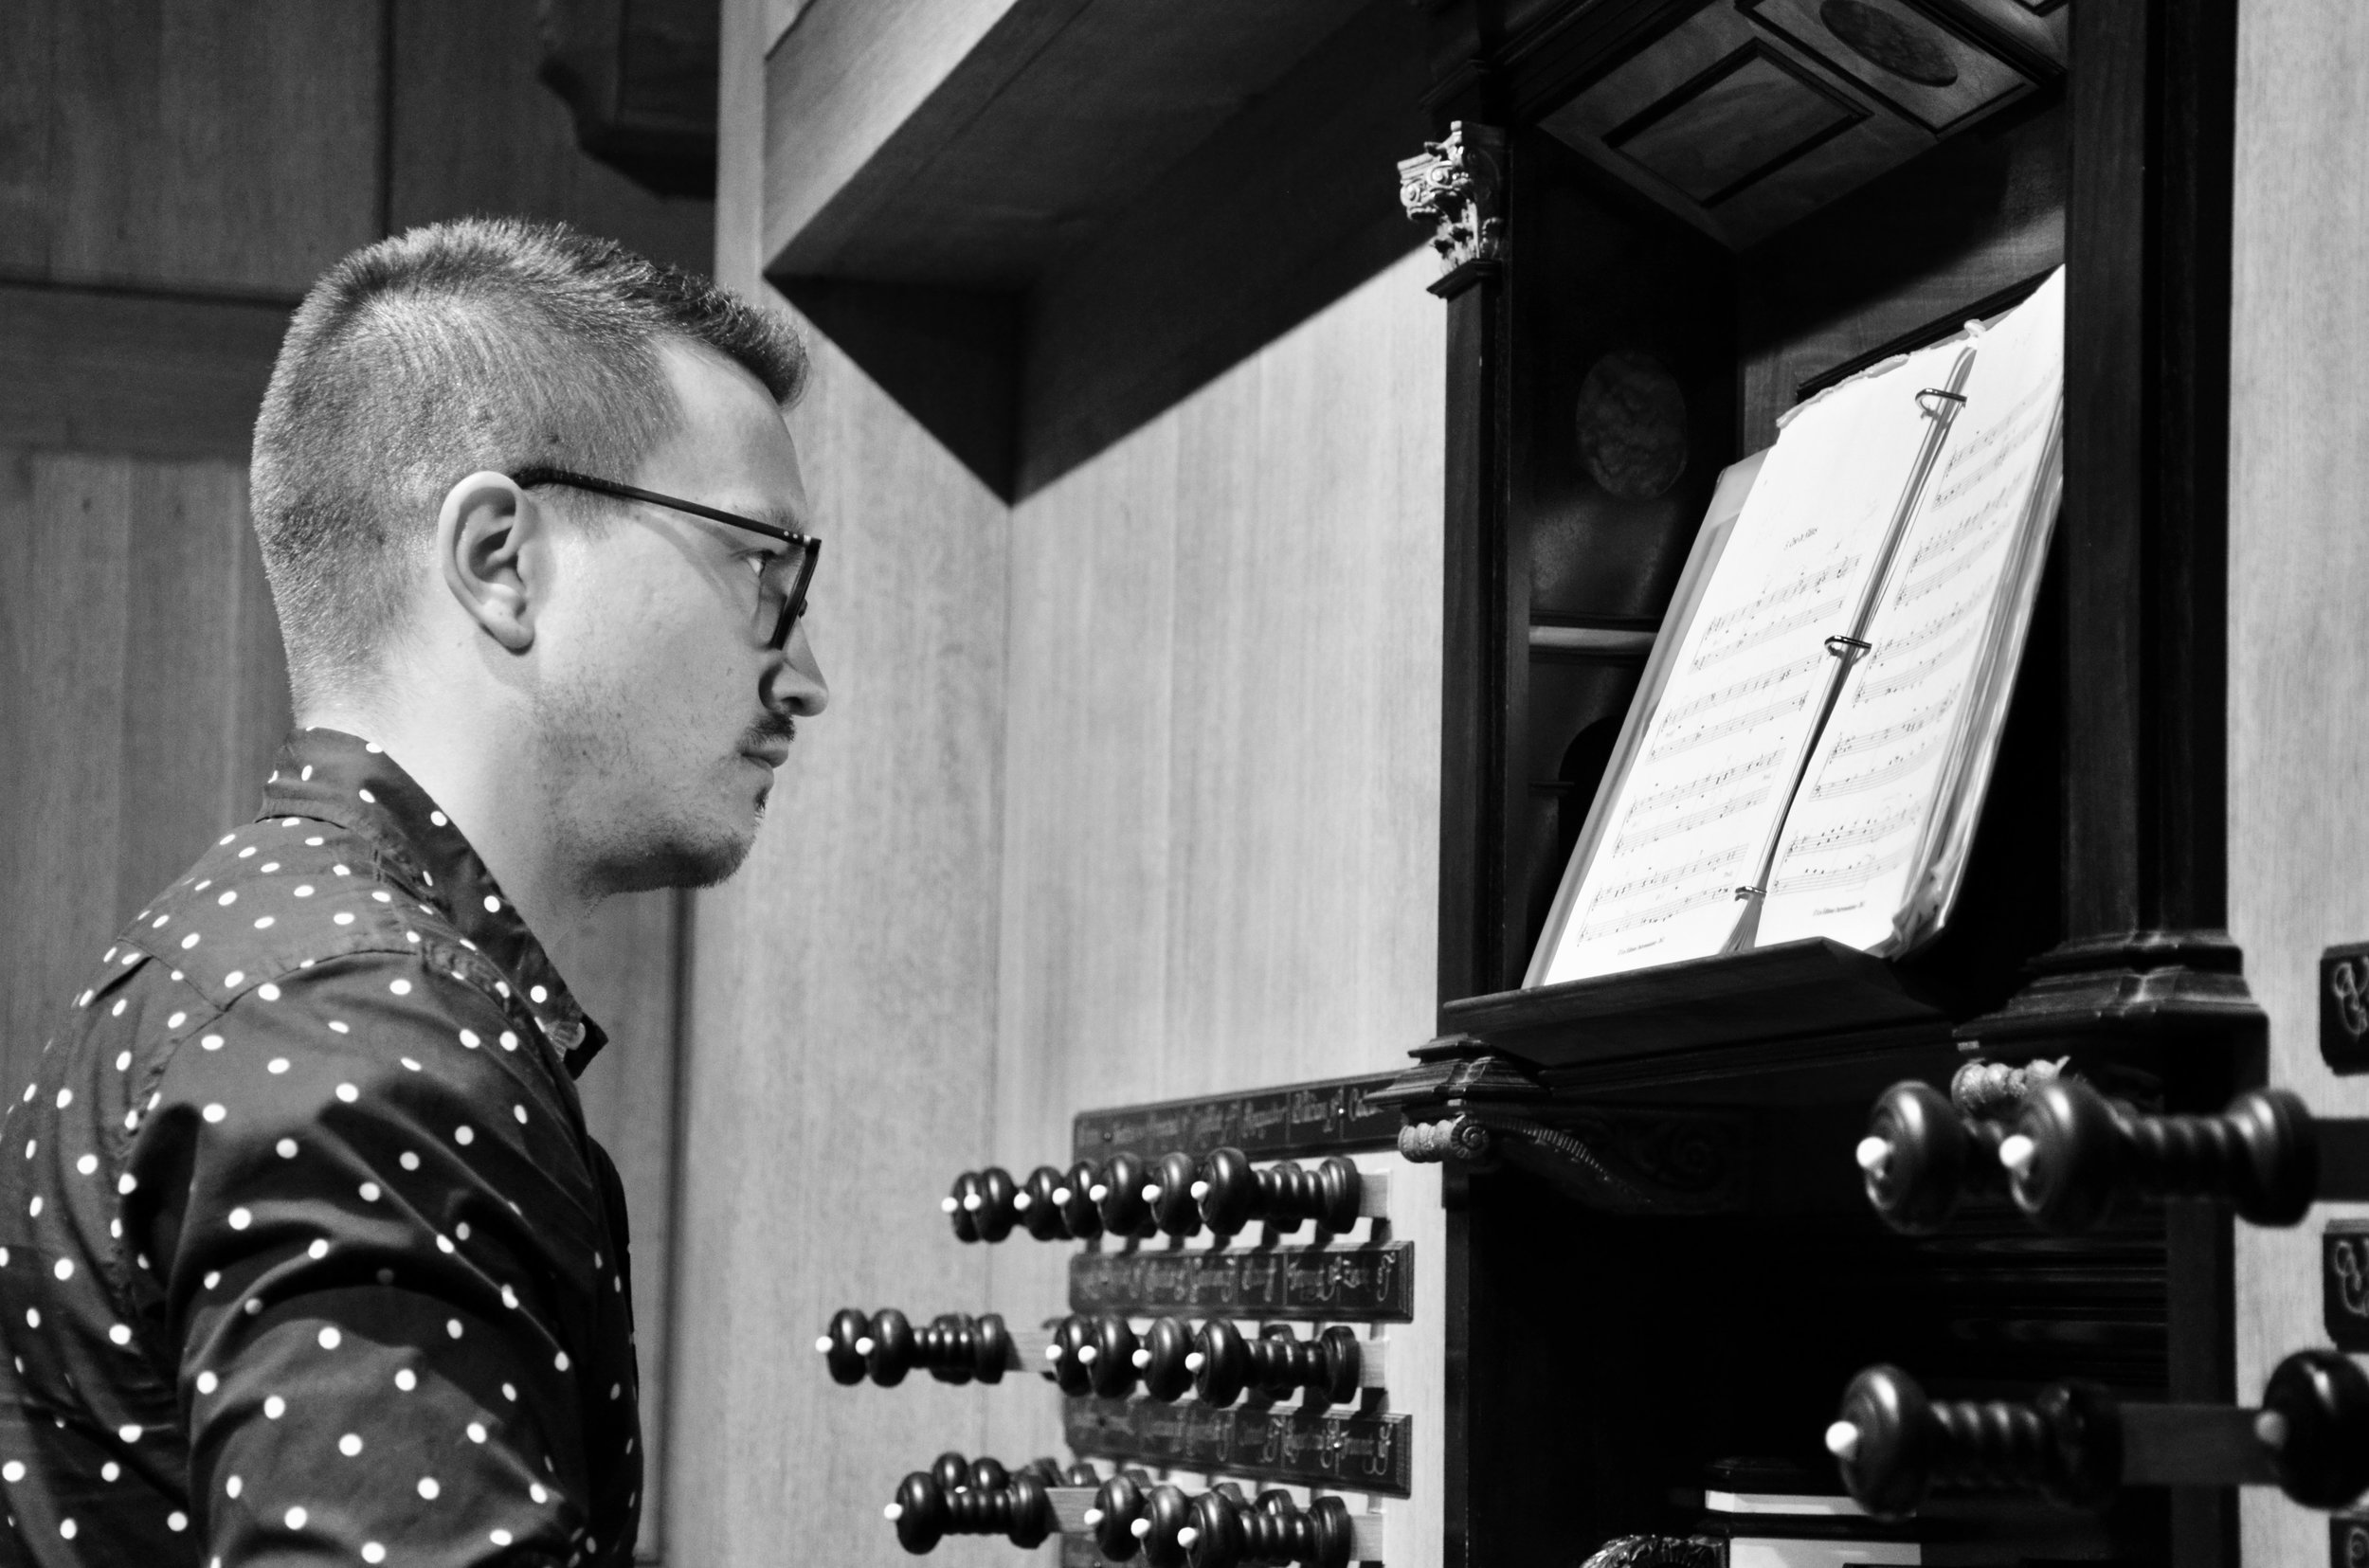 Corey De Tar plays the 2000 GoART North German Baroque Research Organ in Örgryte New Church, Göteborg, Sweden.